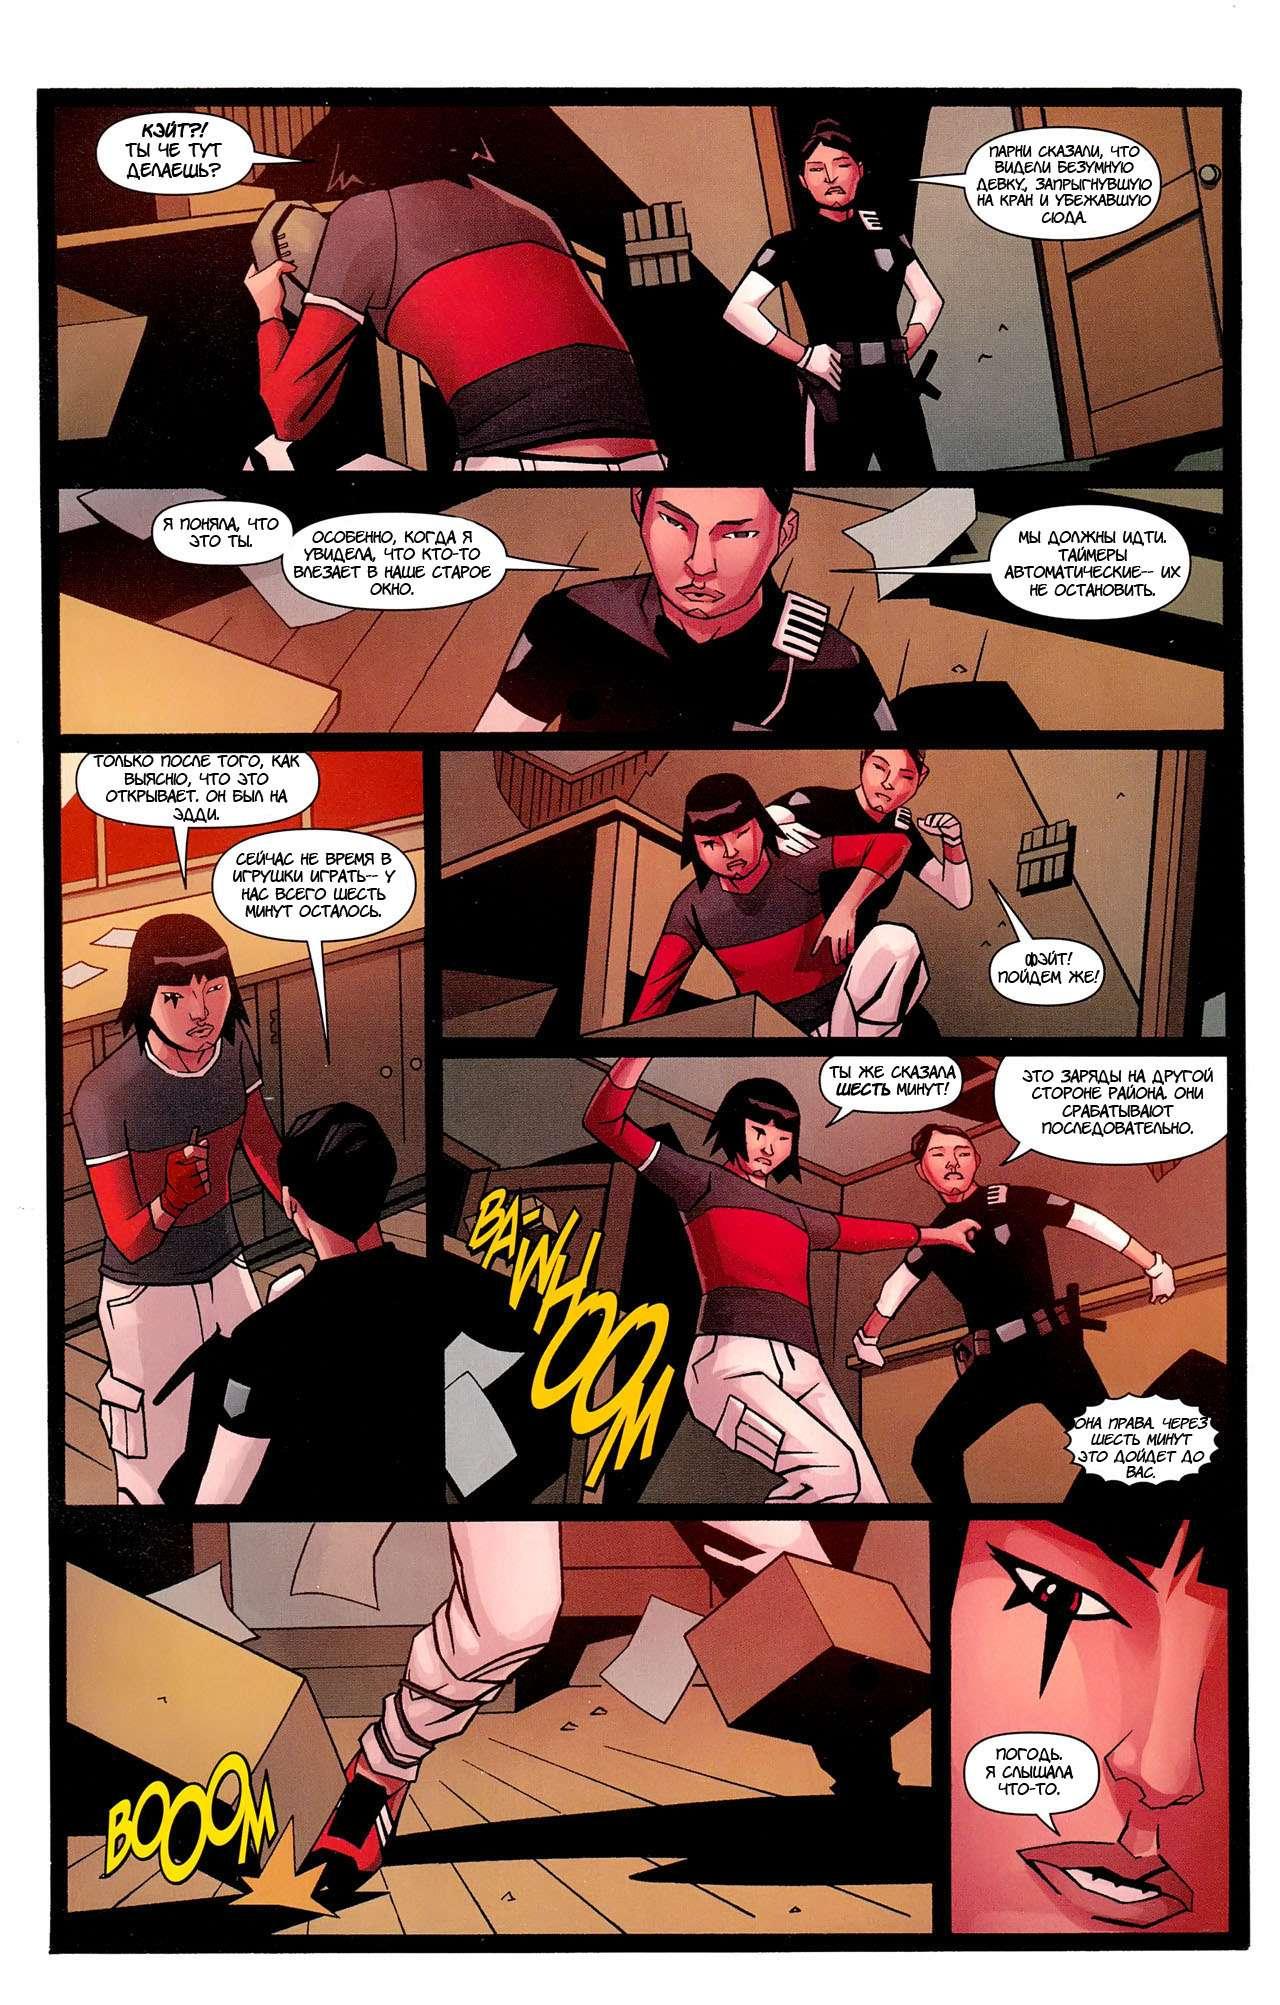 mirrors-edge-05-pg-31